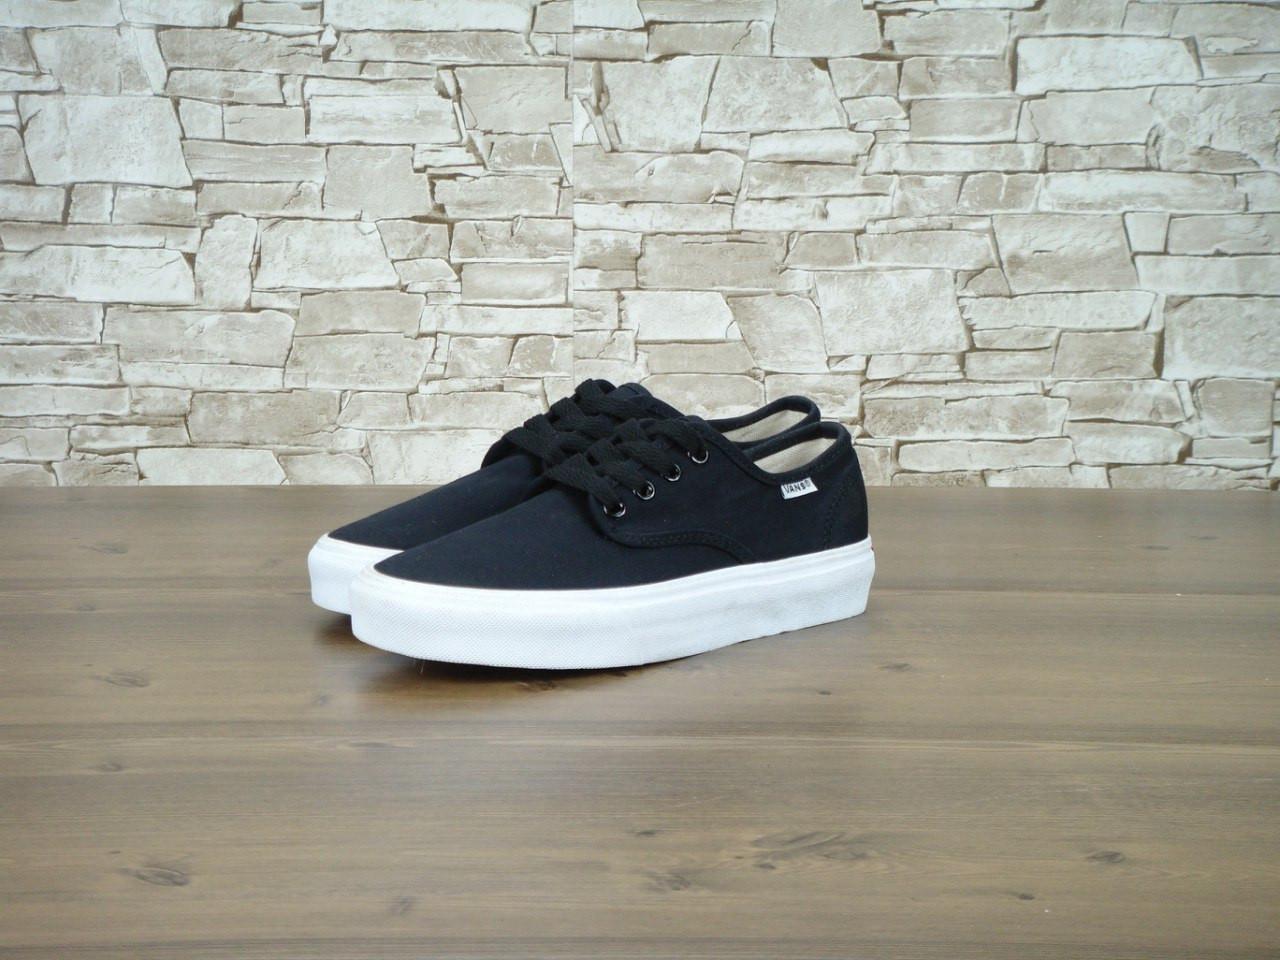 Кеды Vans Authentic Black White Sole - Интернет-магазин «Reverie Shoes» в 6ecd982409c